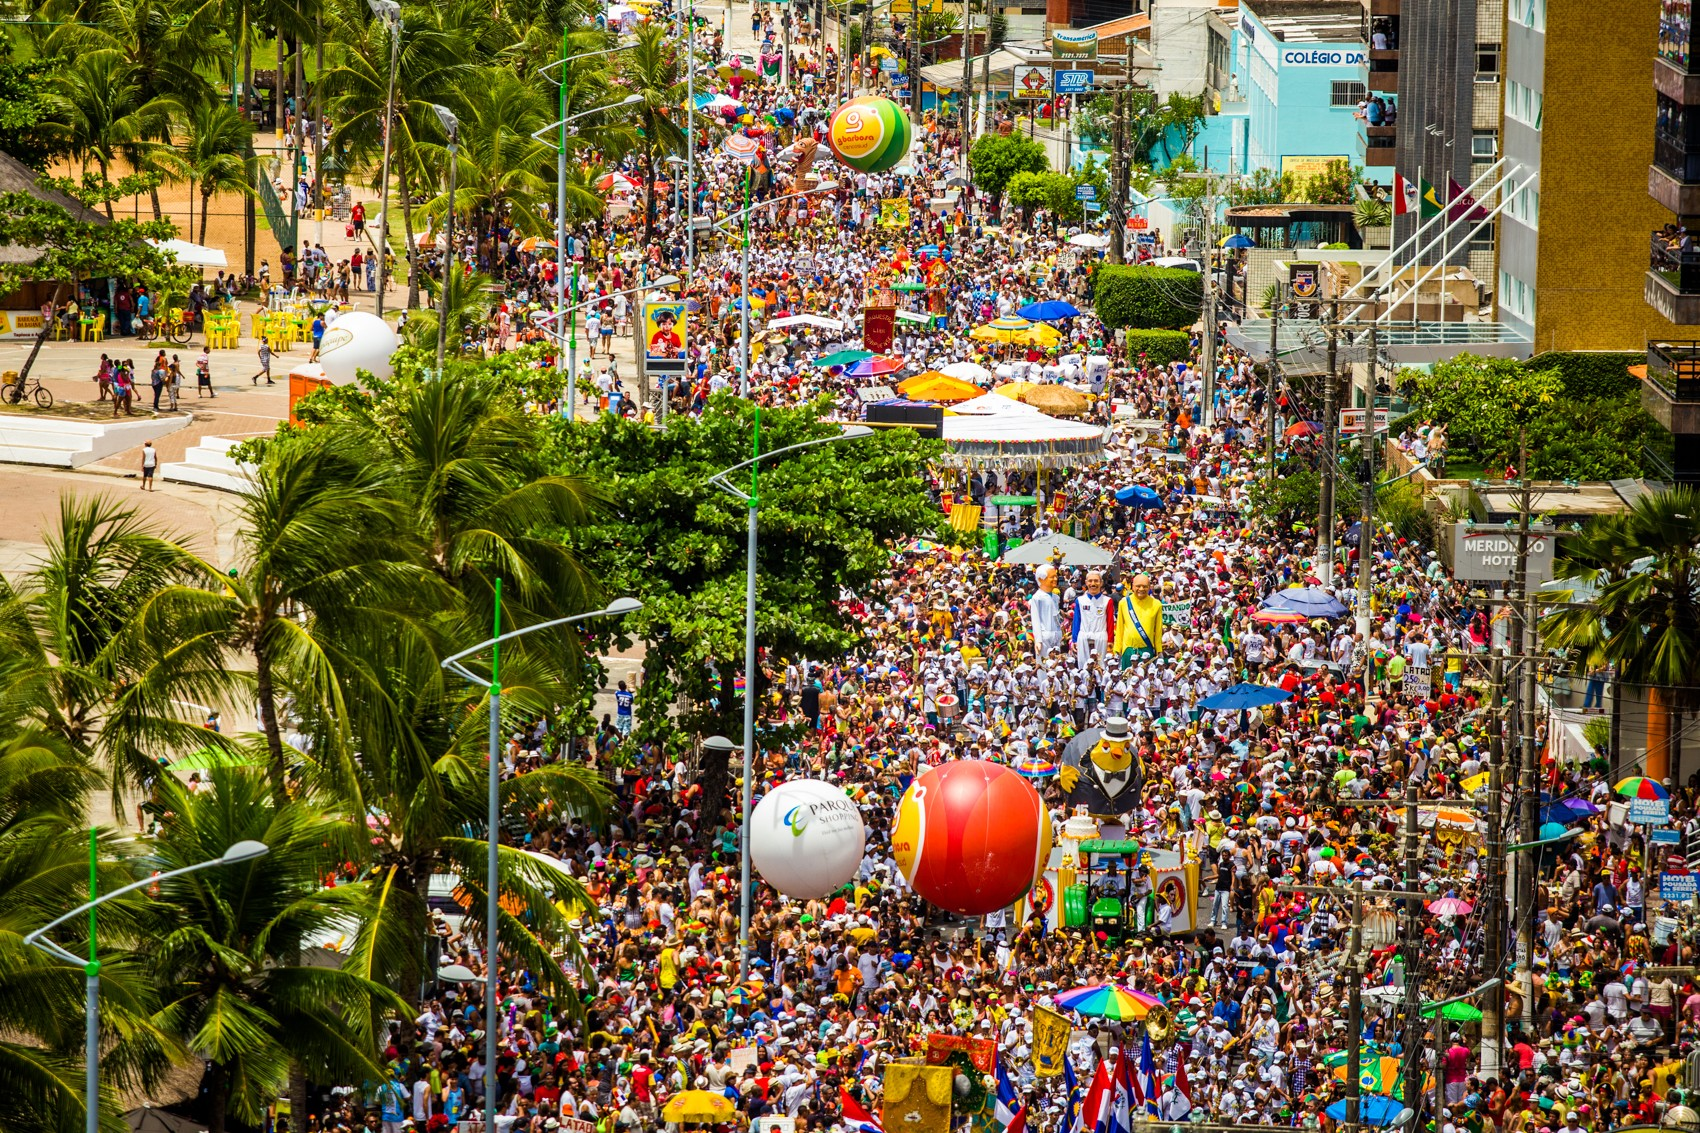 Secretaria da Cultura de AL divulga apoio financeiro para 25 blocos de carnaval